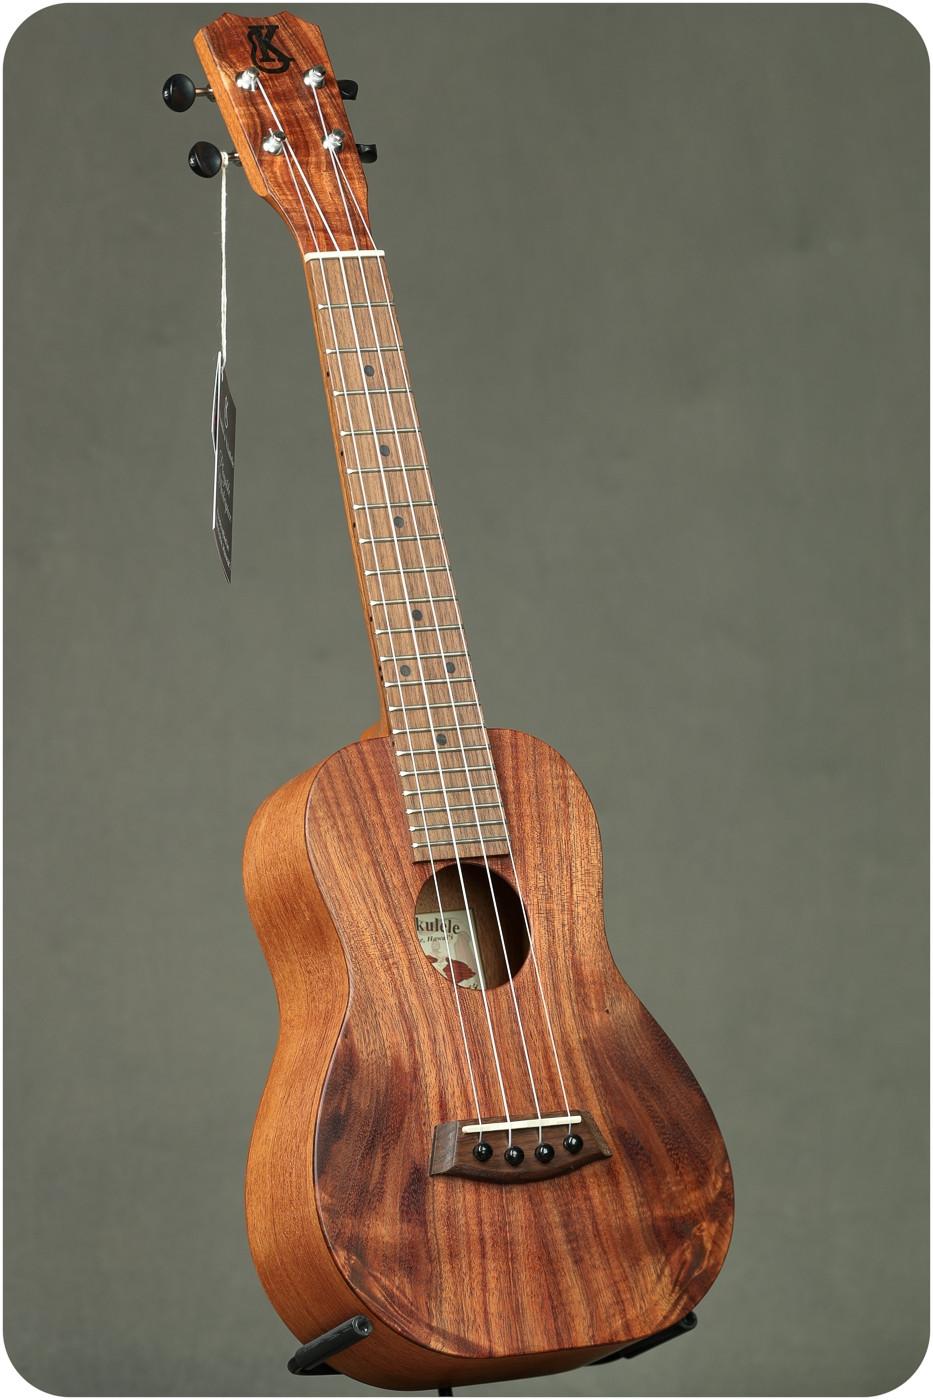 Kanile'a Koa/ Mahogany Concert (OHA-C 21602)